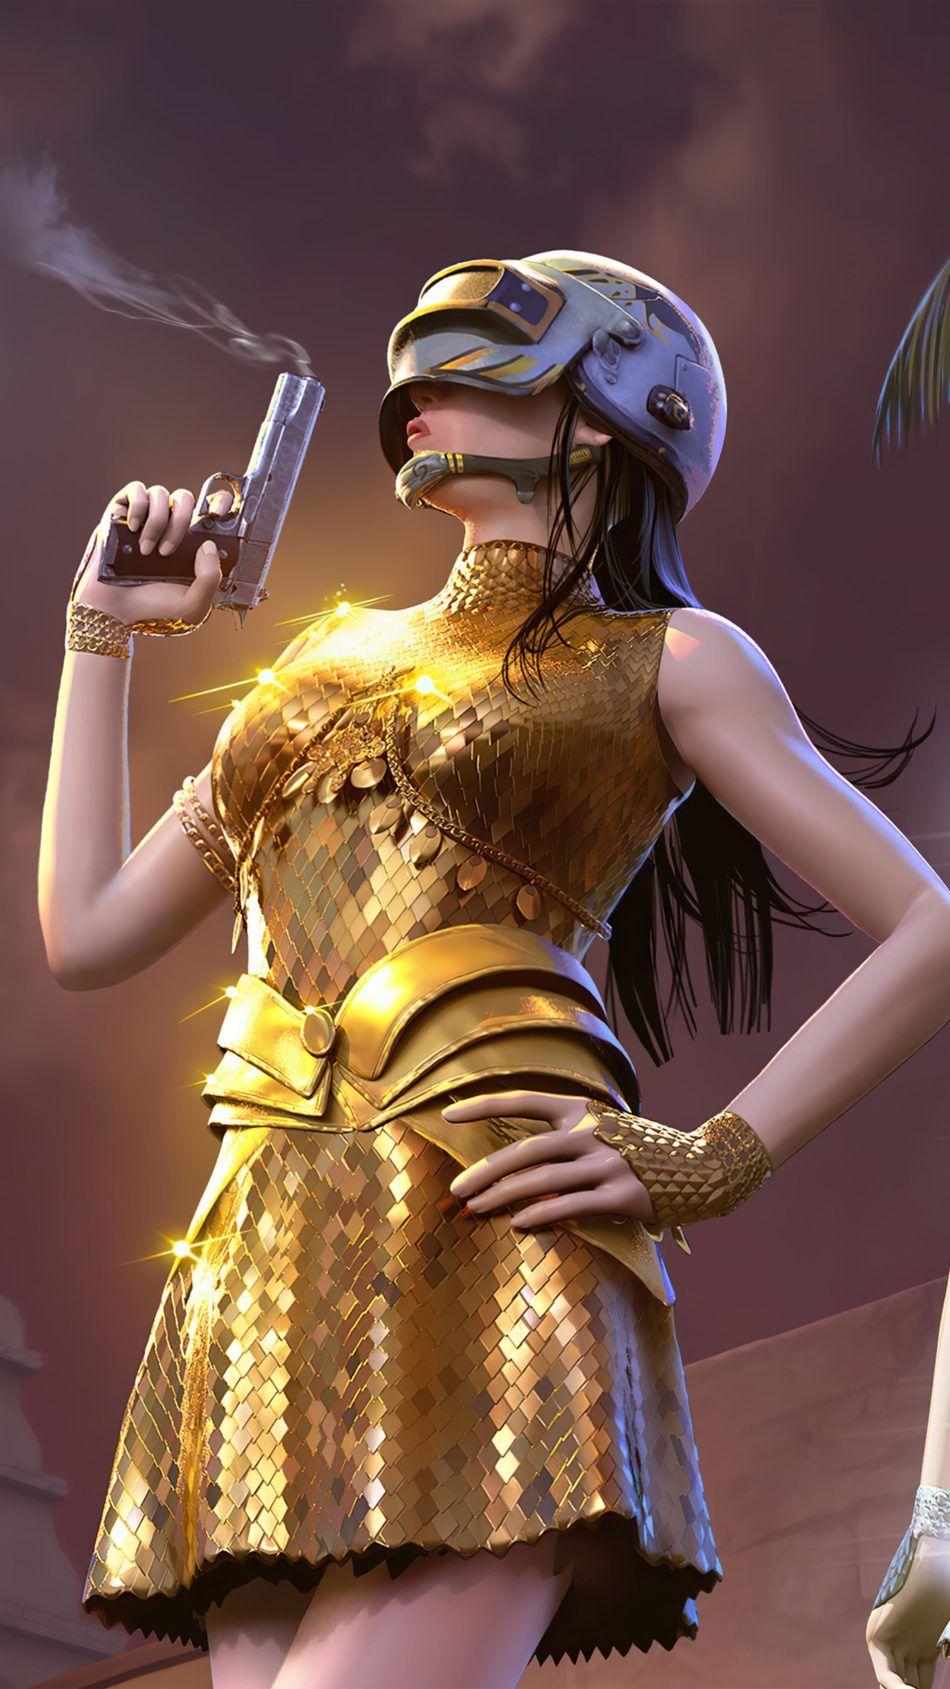 PUBG Girl Golden Dress 4K Ultra HD Mobile Wallpaper